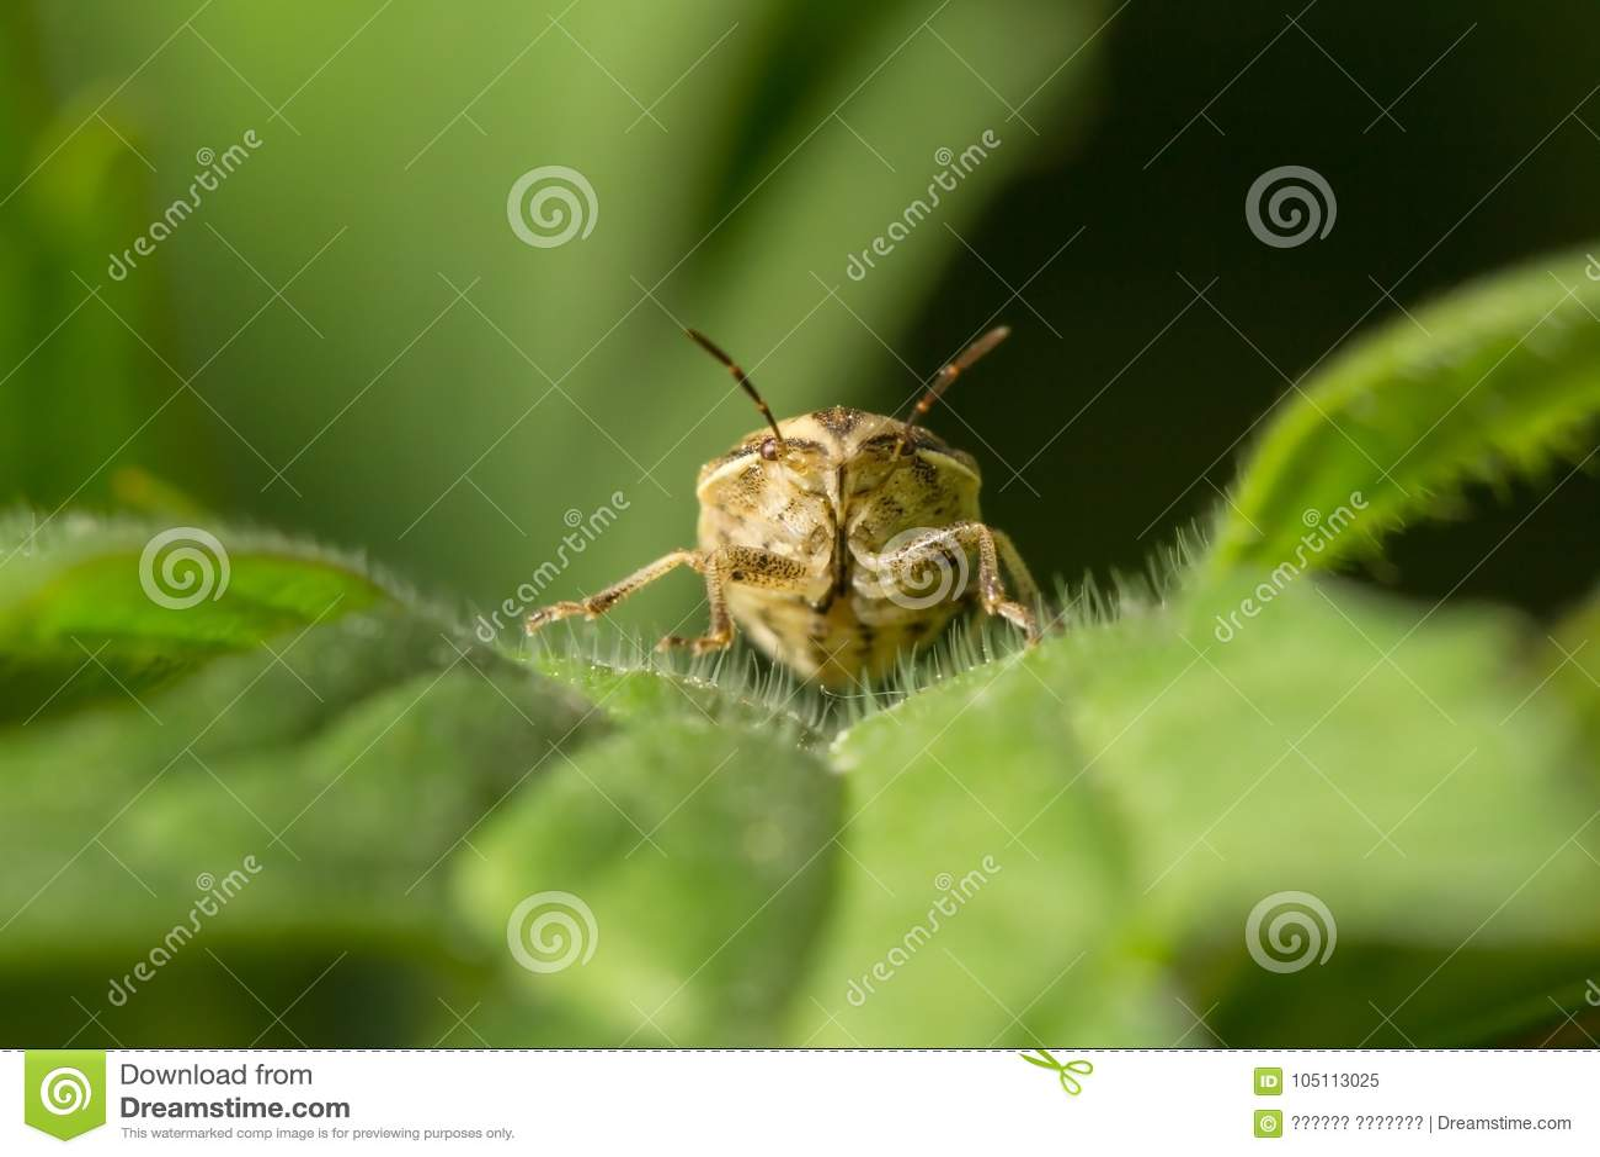 Wildlife μακρόκοσμος όμορφα έντομα Ζωύφια, αράχνες, πεταλούδες και άλλα όμορφα έντομα